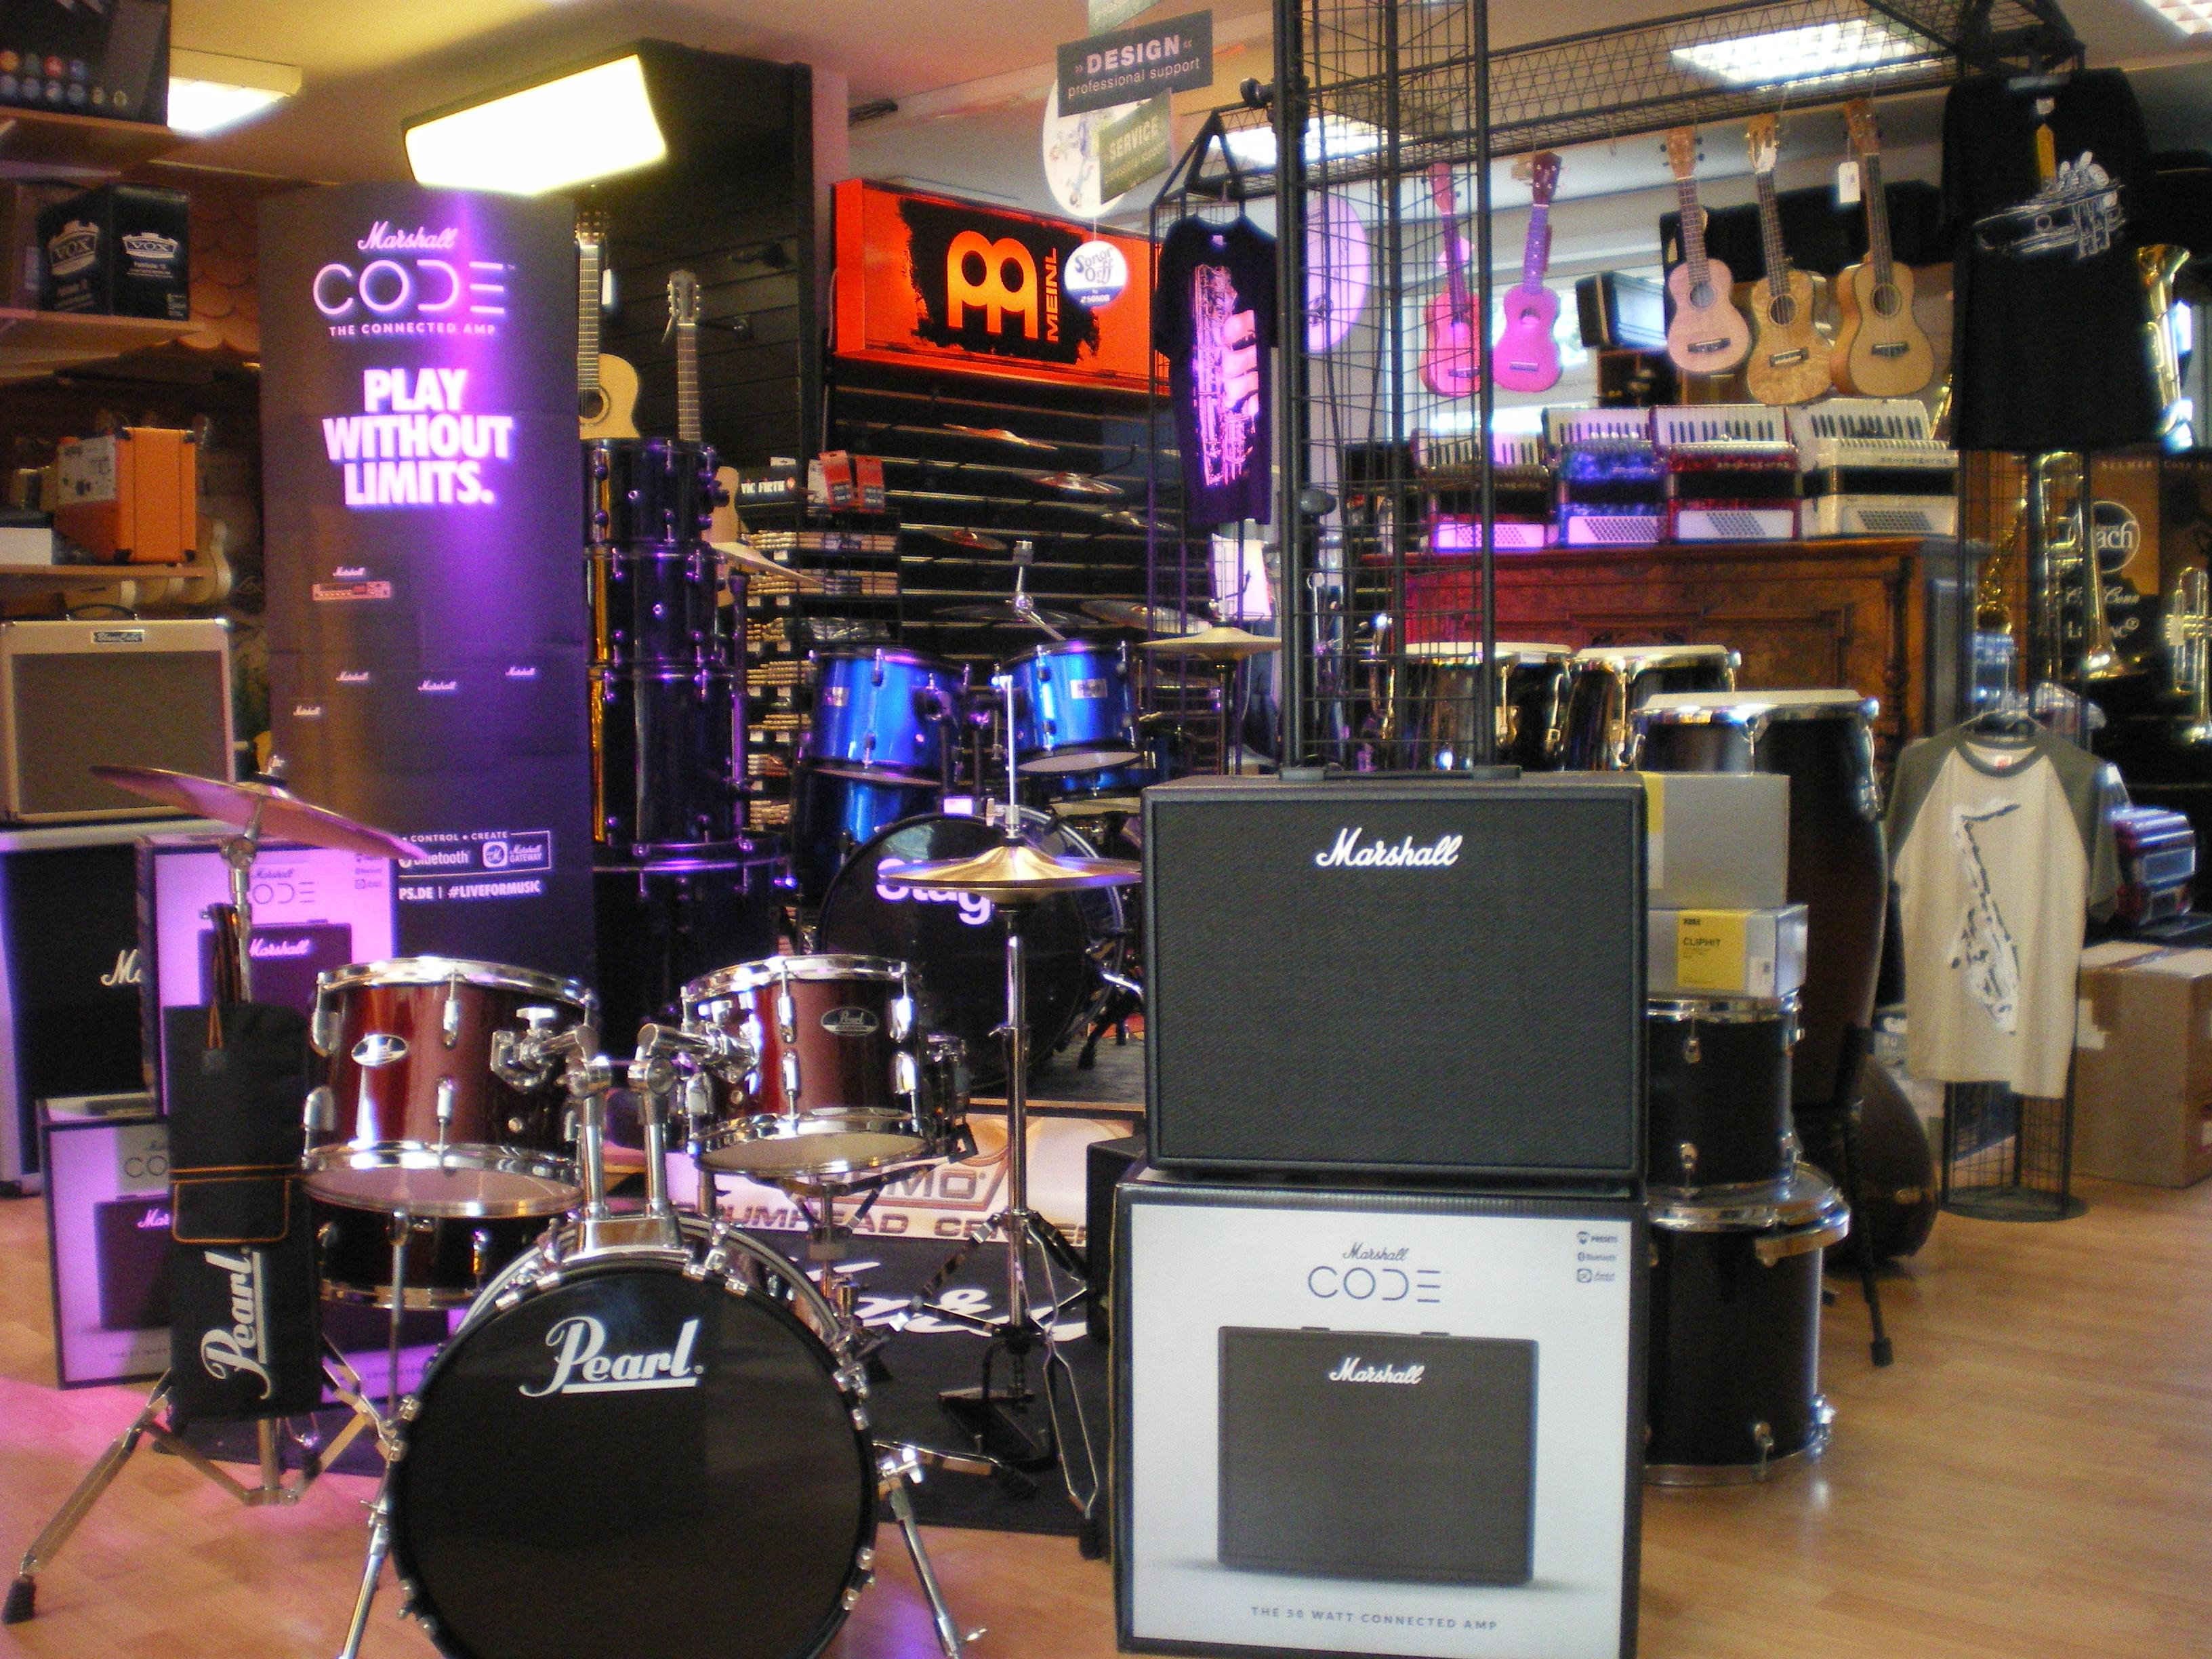 http://www.musikhaus-syhre.de/wordpress/wp-content/uploads/2017/02/24.jpg